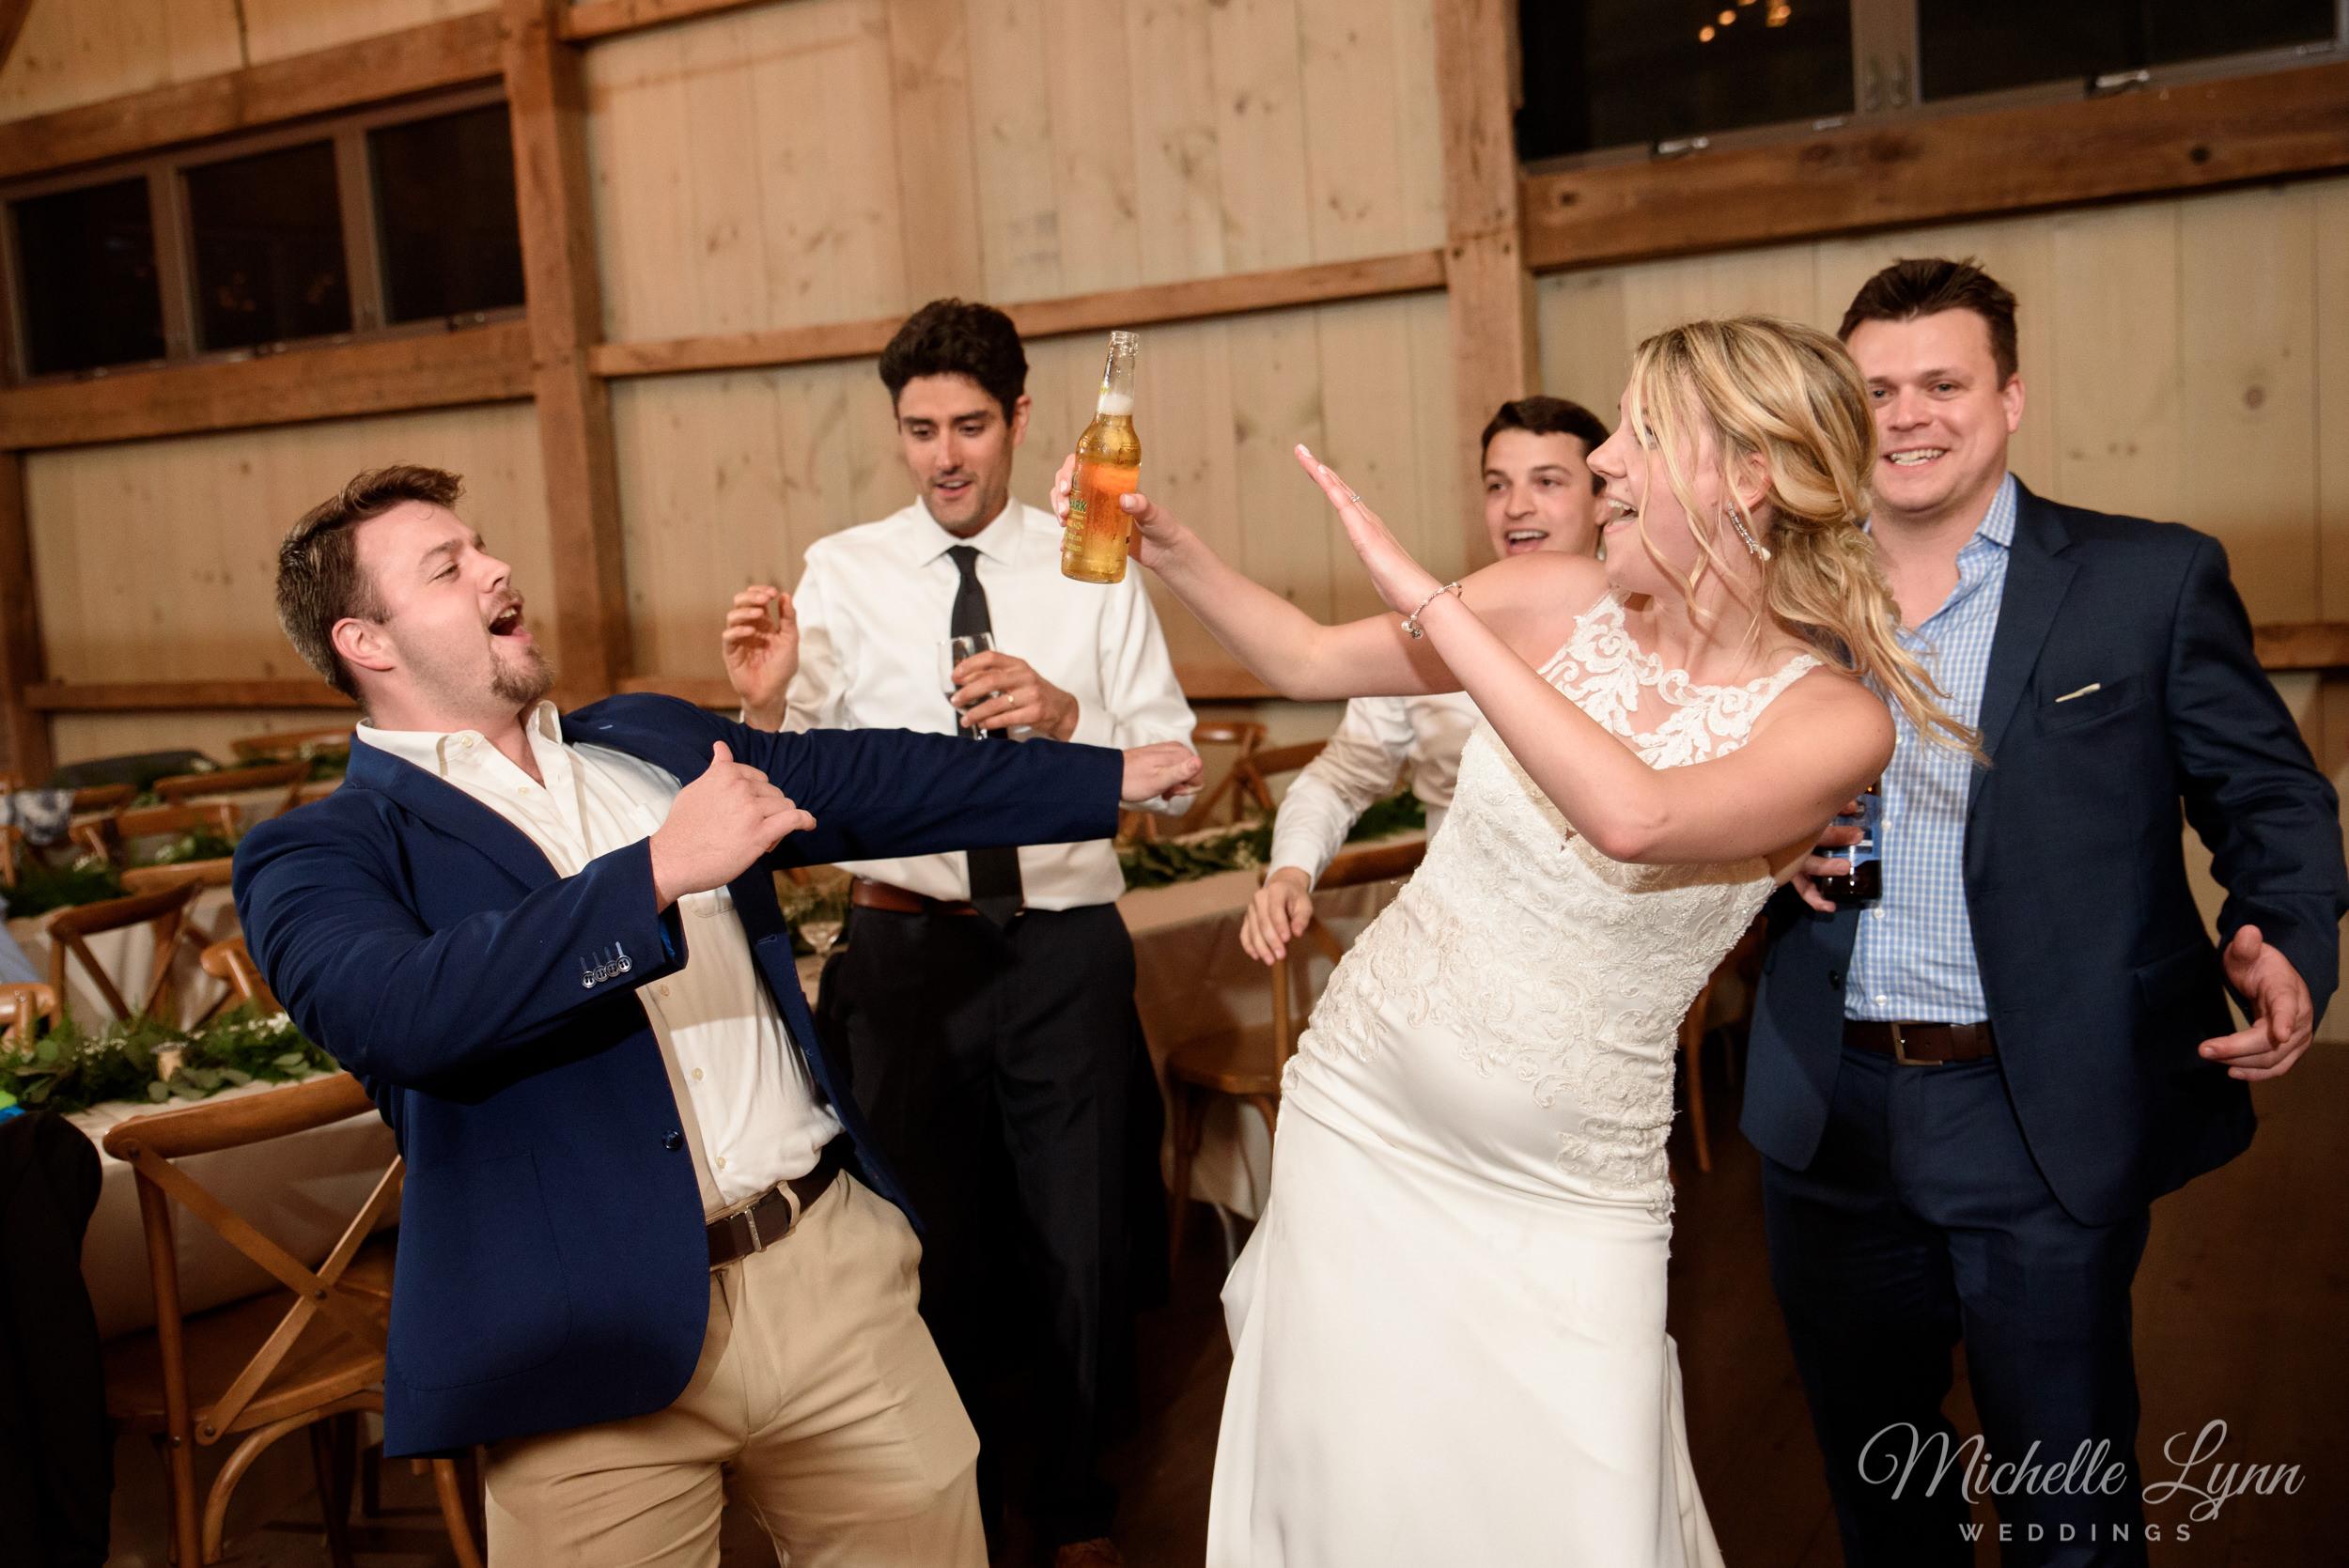 mlw-the-farm-bakery-and-events-wedding-photos-89.jpg